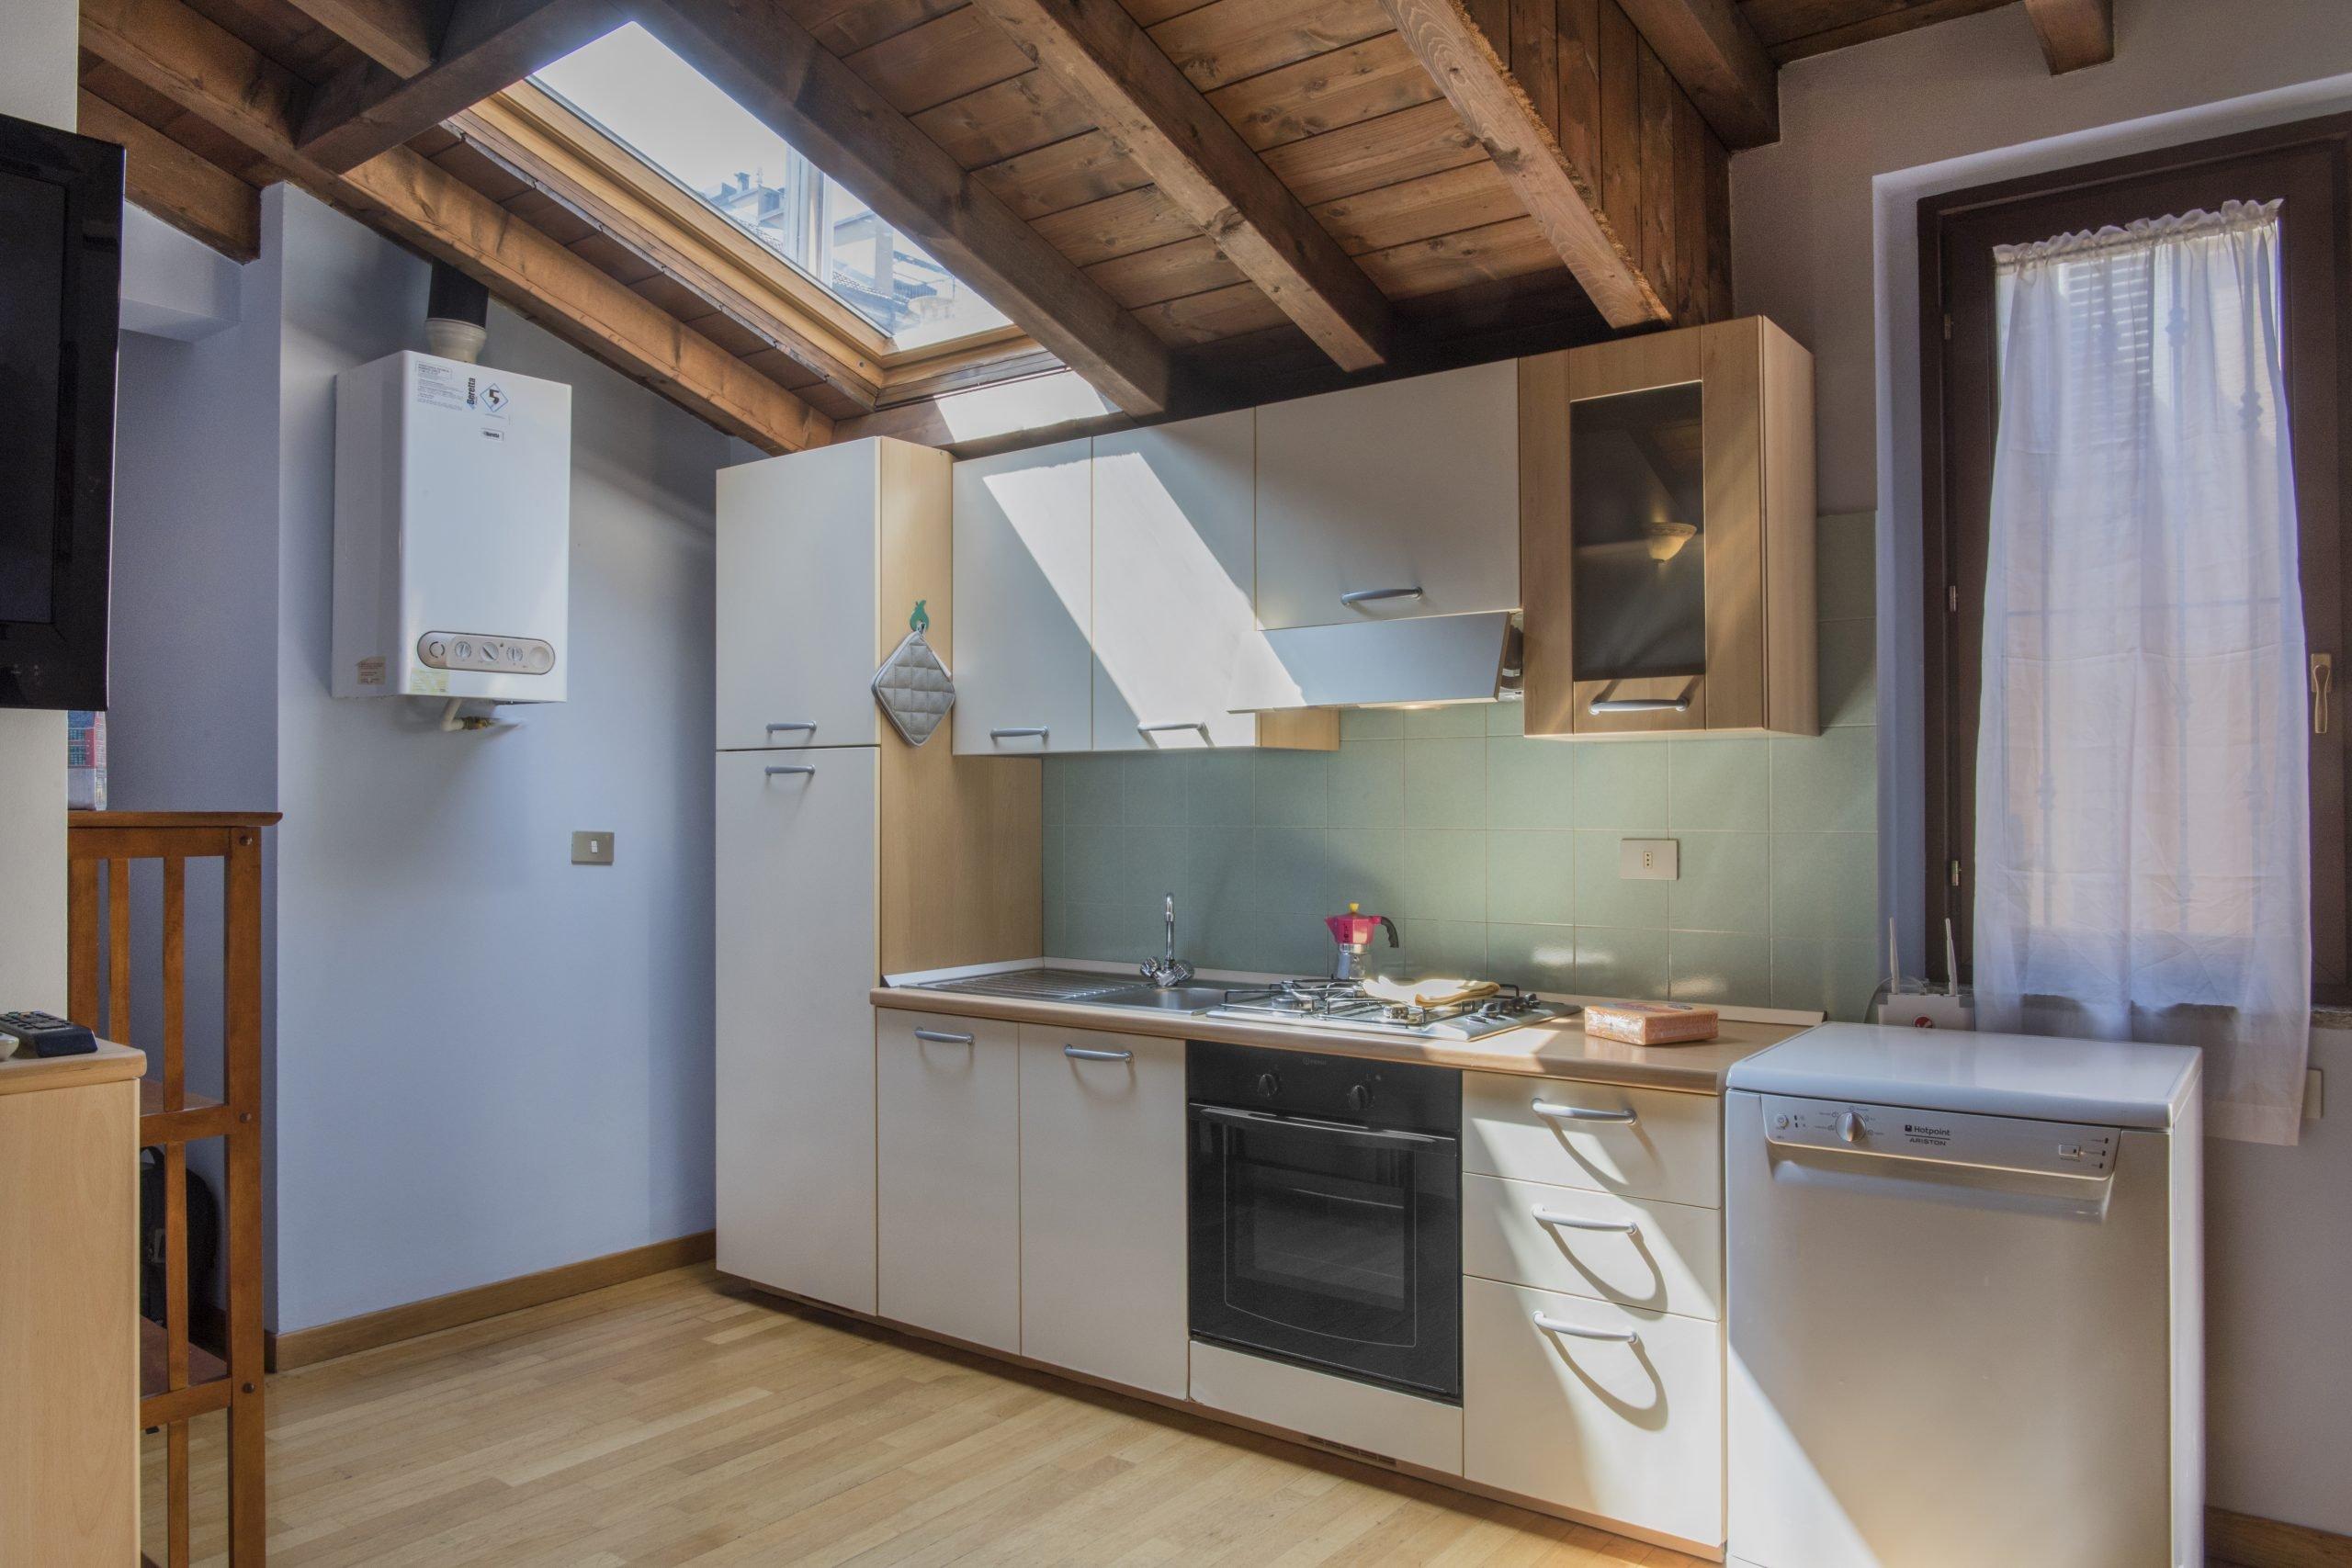 tricloacale chiaralba diadema cucina